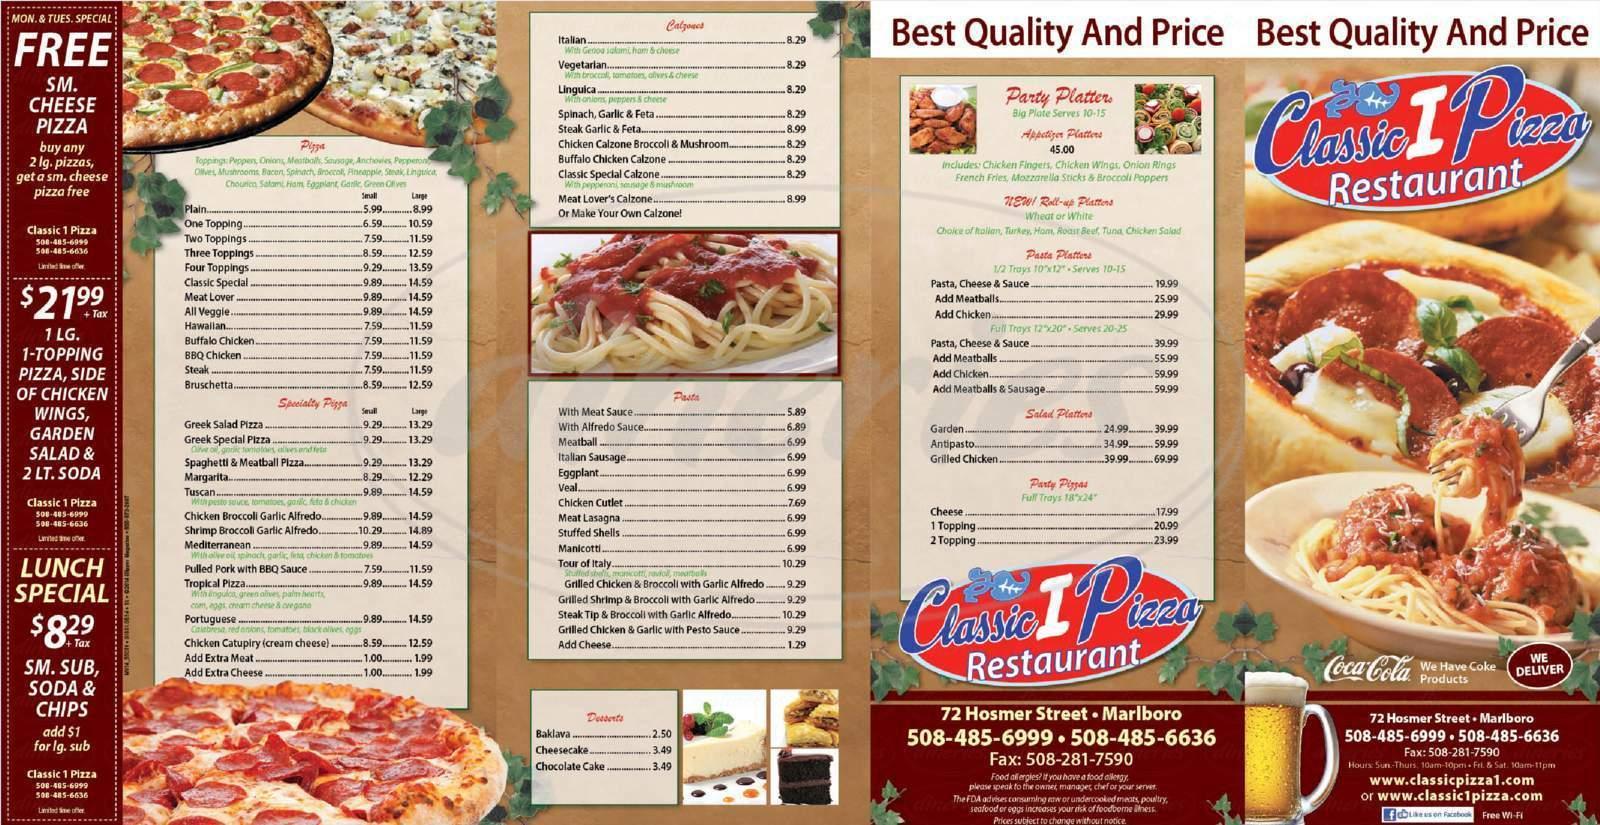 menu for Classic Pizza 1